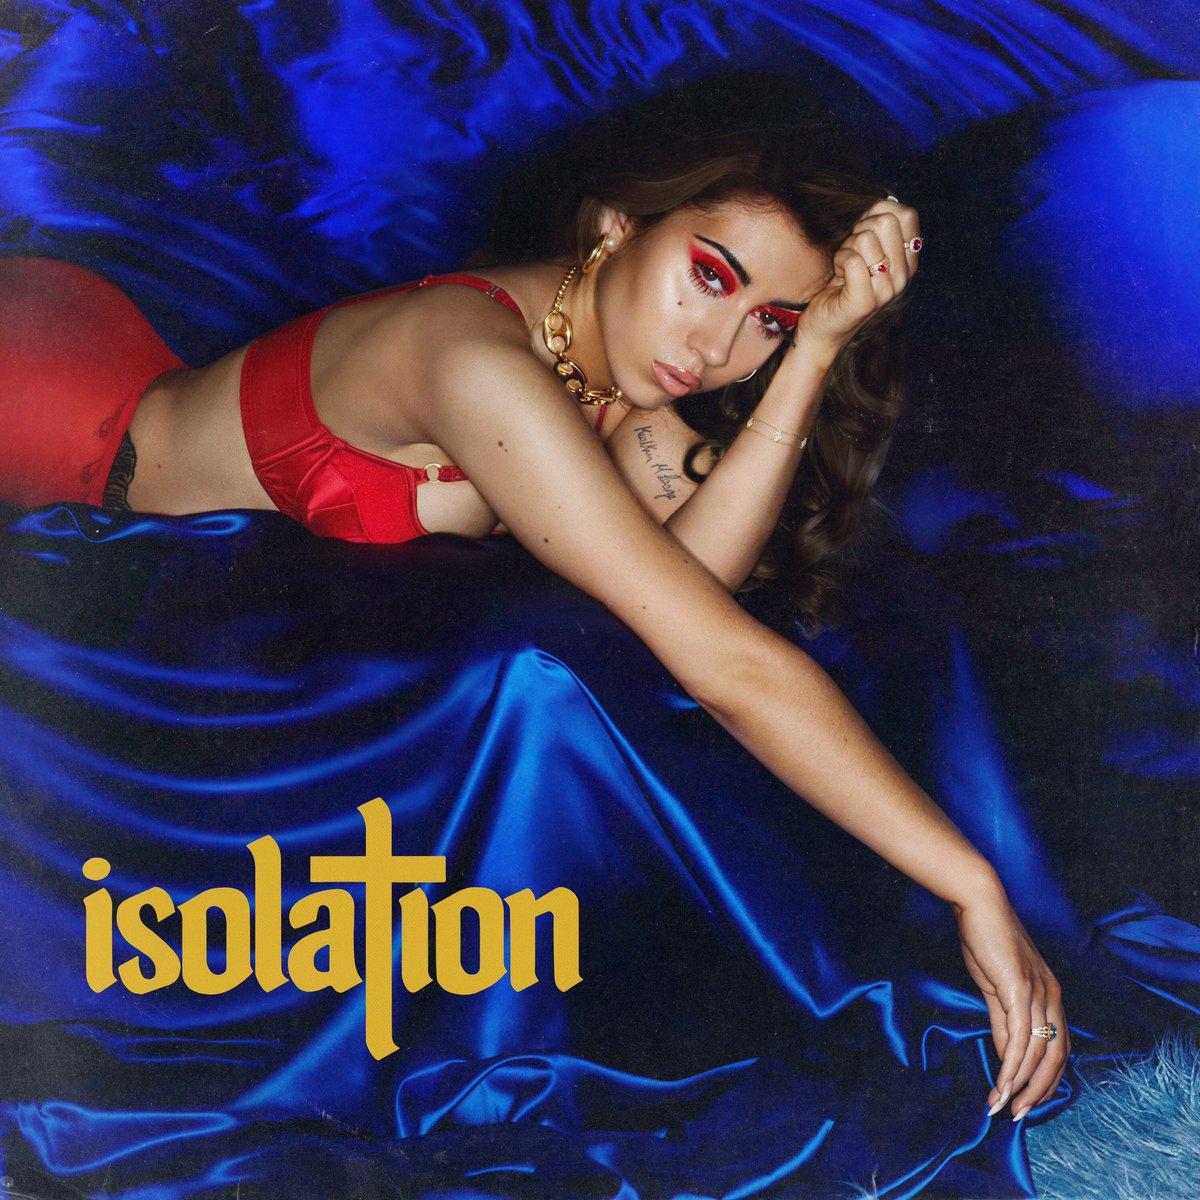 Kali Uchis – Isolation Zip Full Album Download kali uchis – isolation zip full album download Kali Uchis – Isolation Zip Full Album Download DYV15ixUMAAoR2A